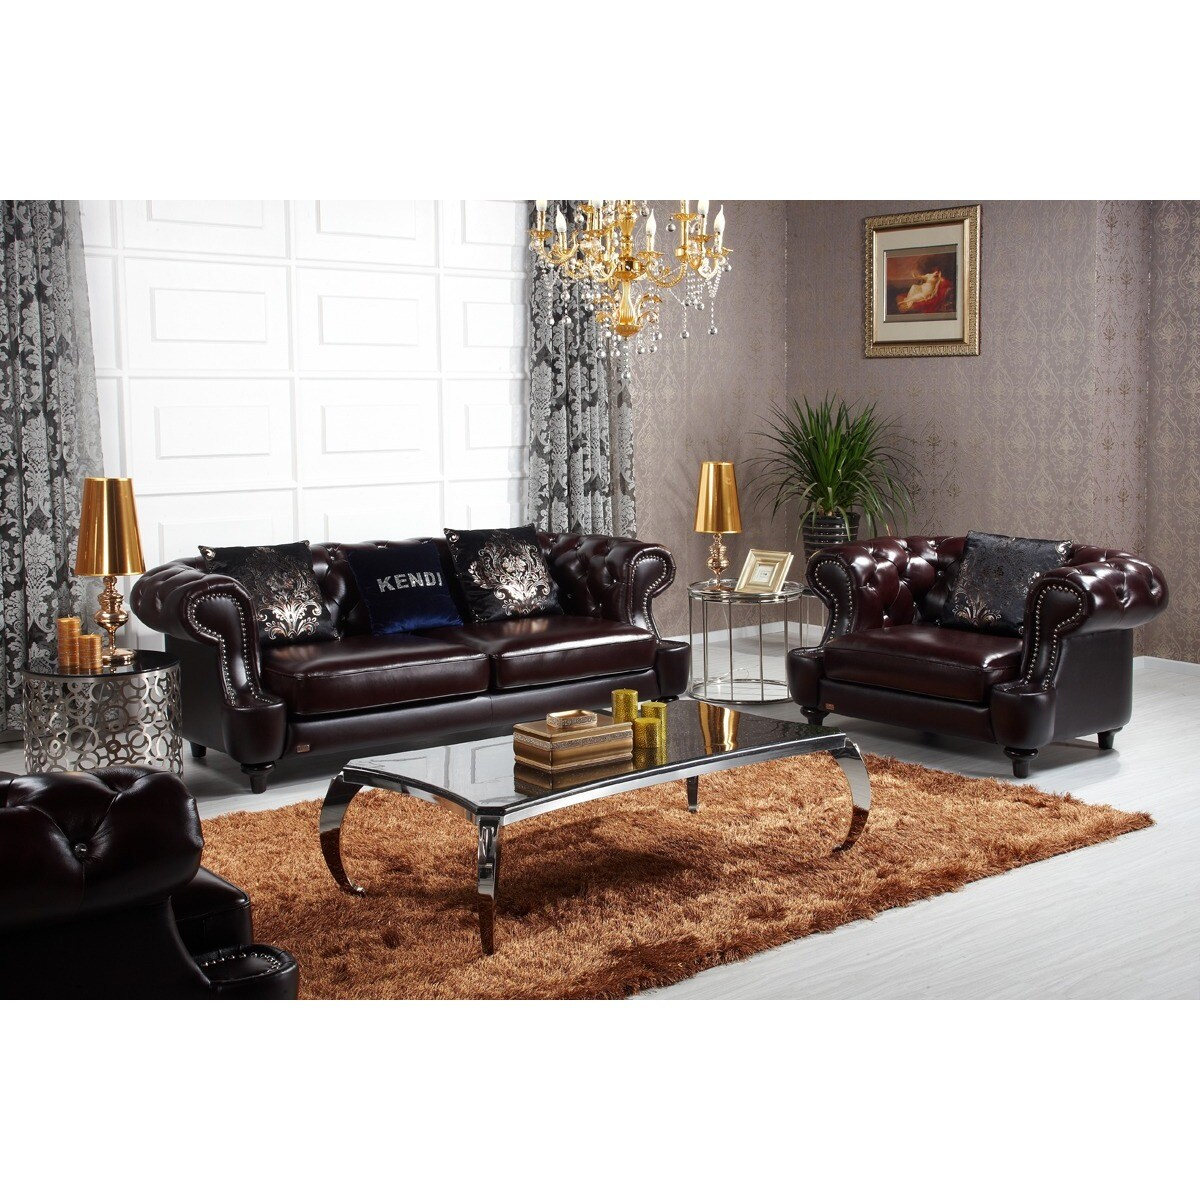 Italian Leather Sofa Set | Estro Salotti Evergreen Modern Black ...